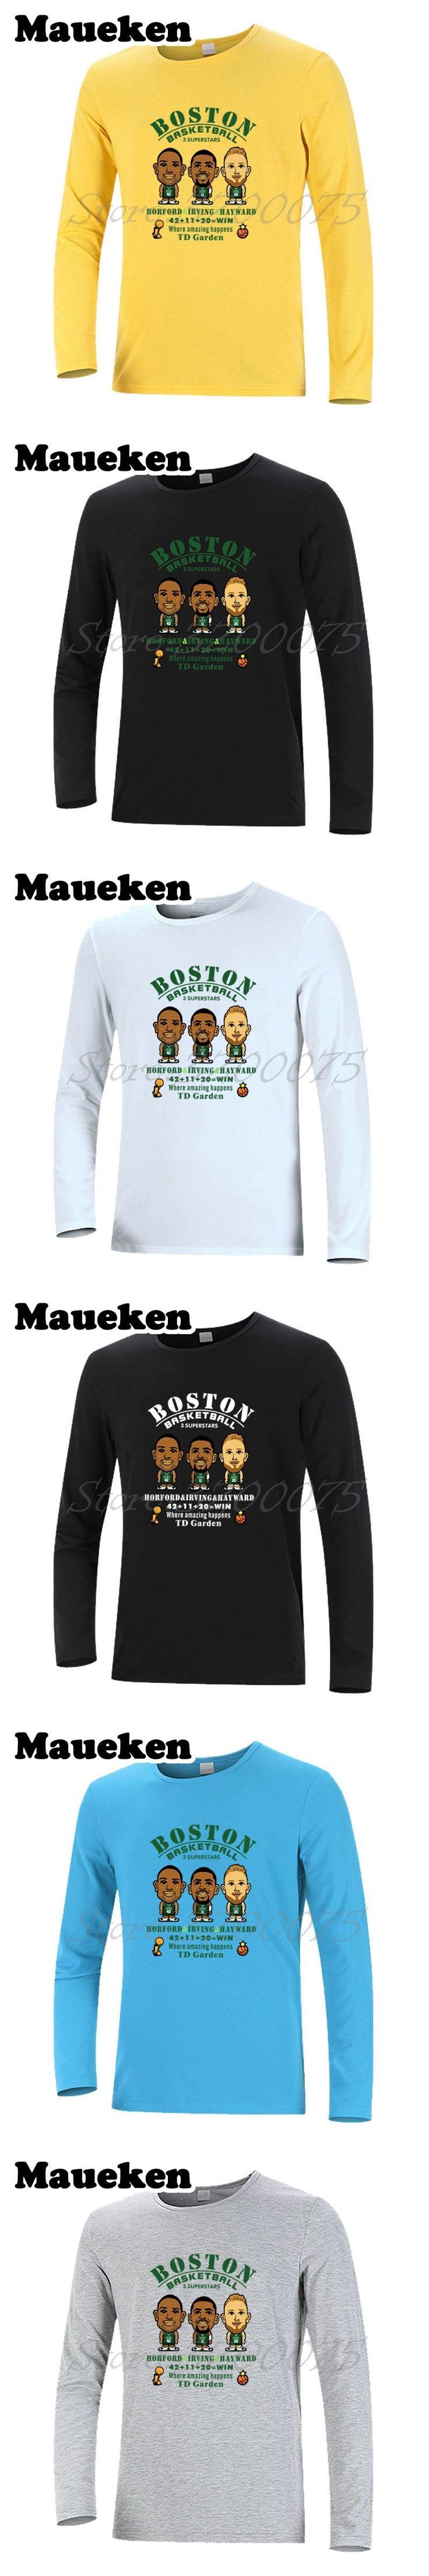 Men Long Sleeve New The Big 3 Superstars Kyrie Irving Gordon Hayward Al Horford boston T-Shirt Clothes T Shirt Men's W17110501